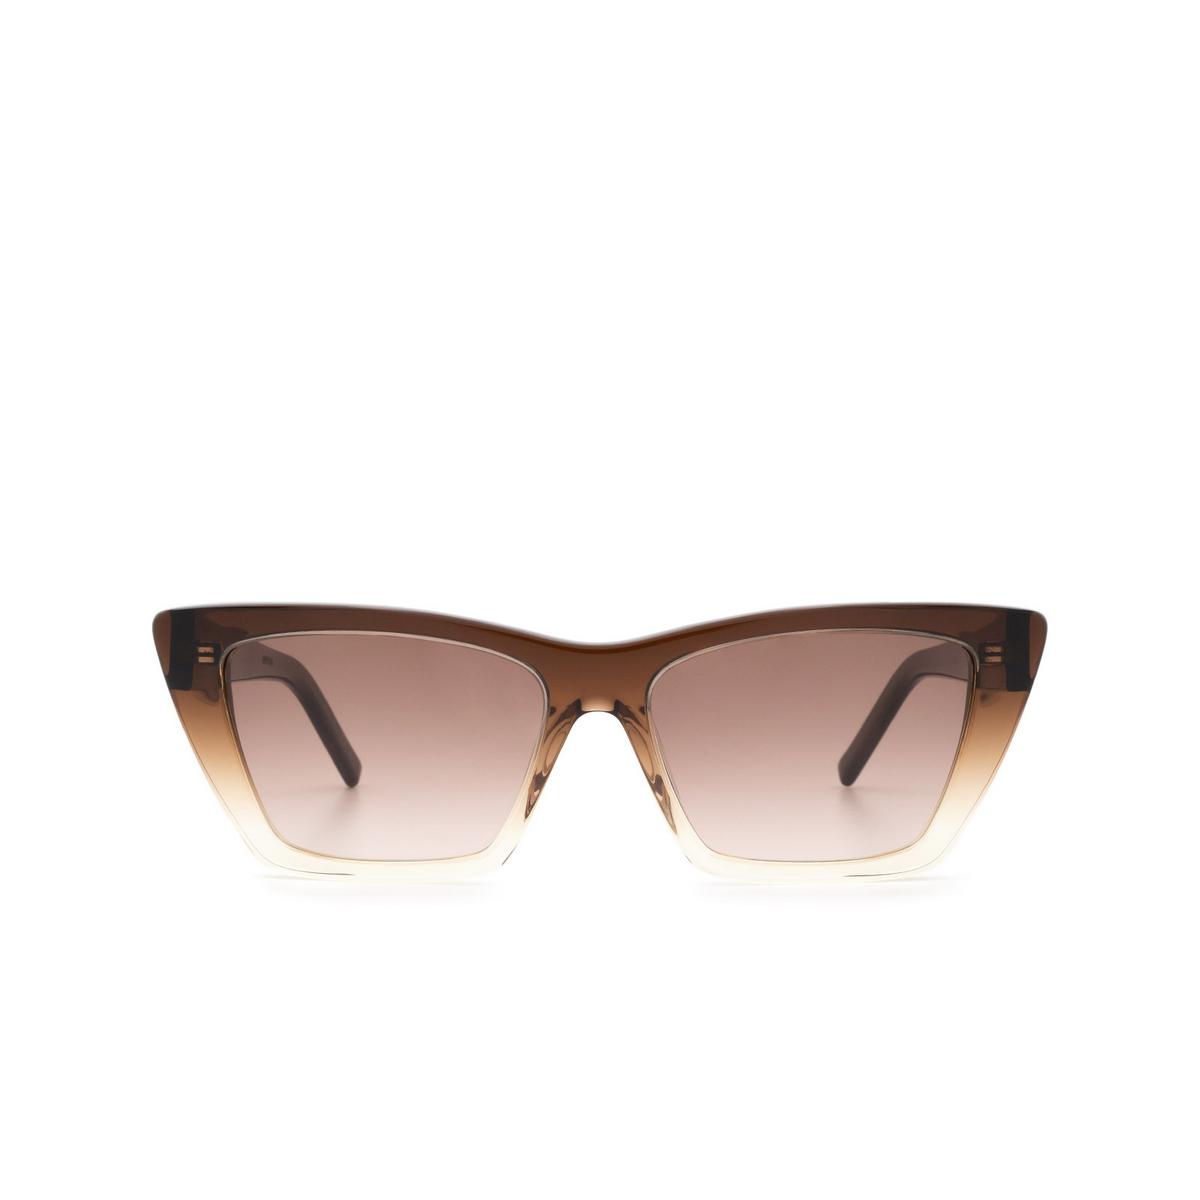 Saint Laurent® Cat-eye Sunglasses: Mica SL 276 color Brown 019.